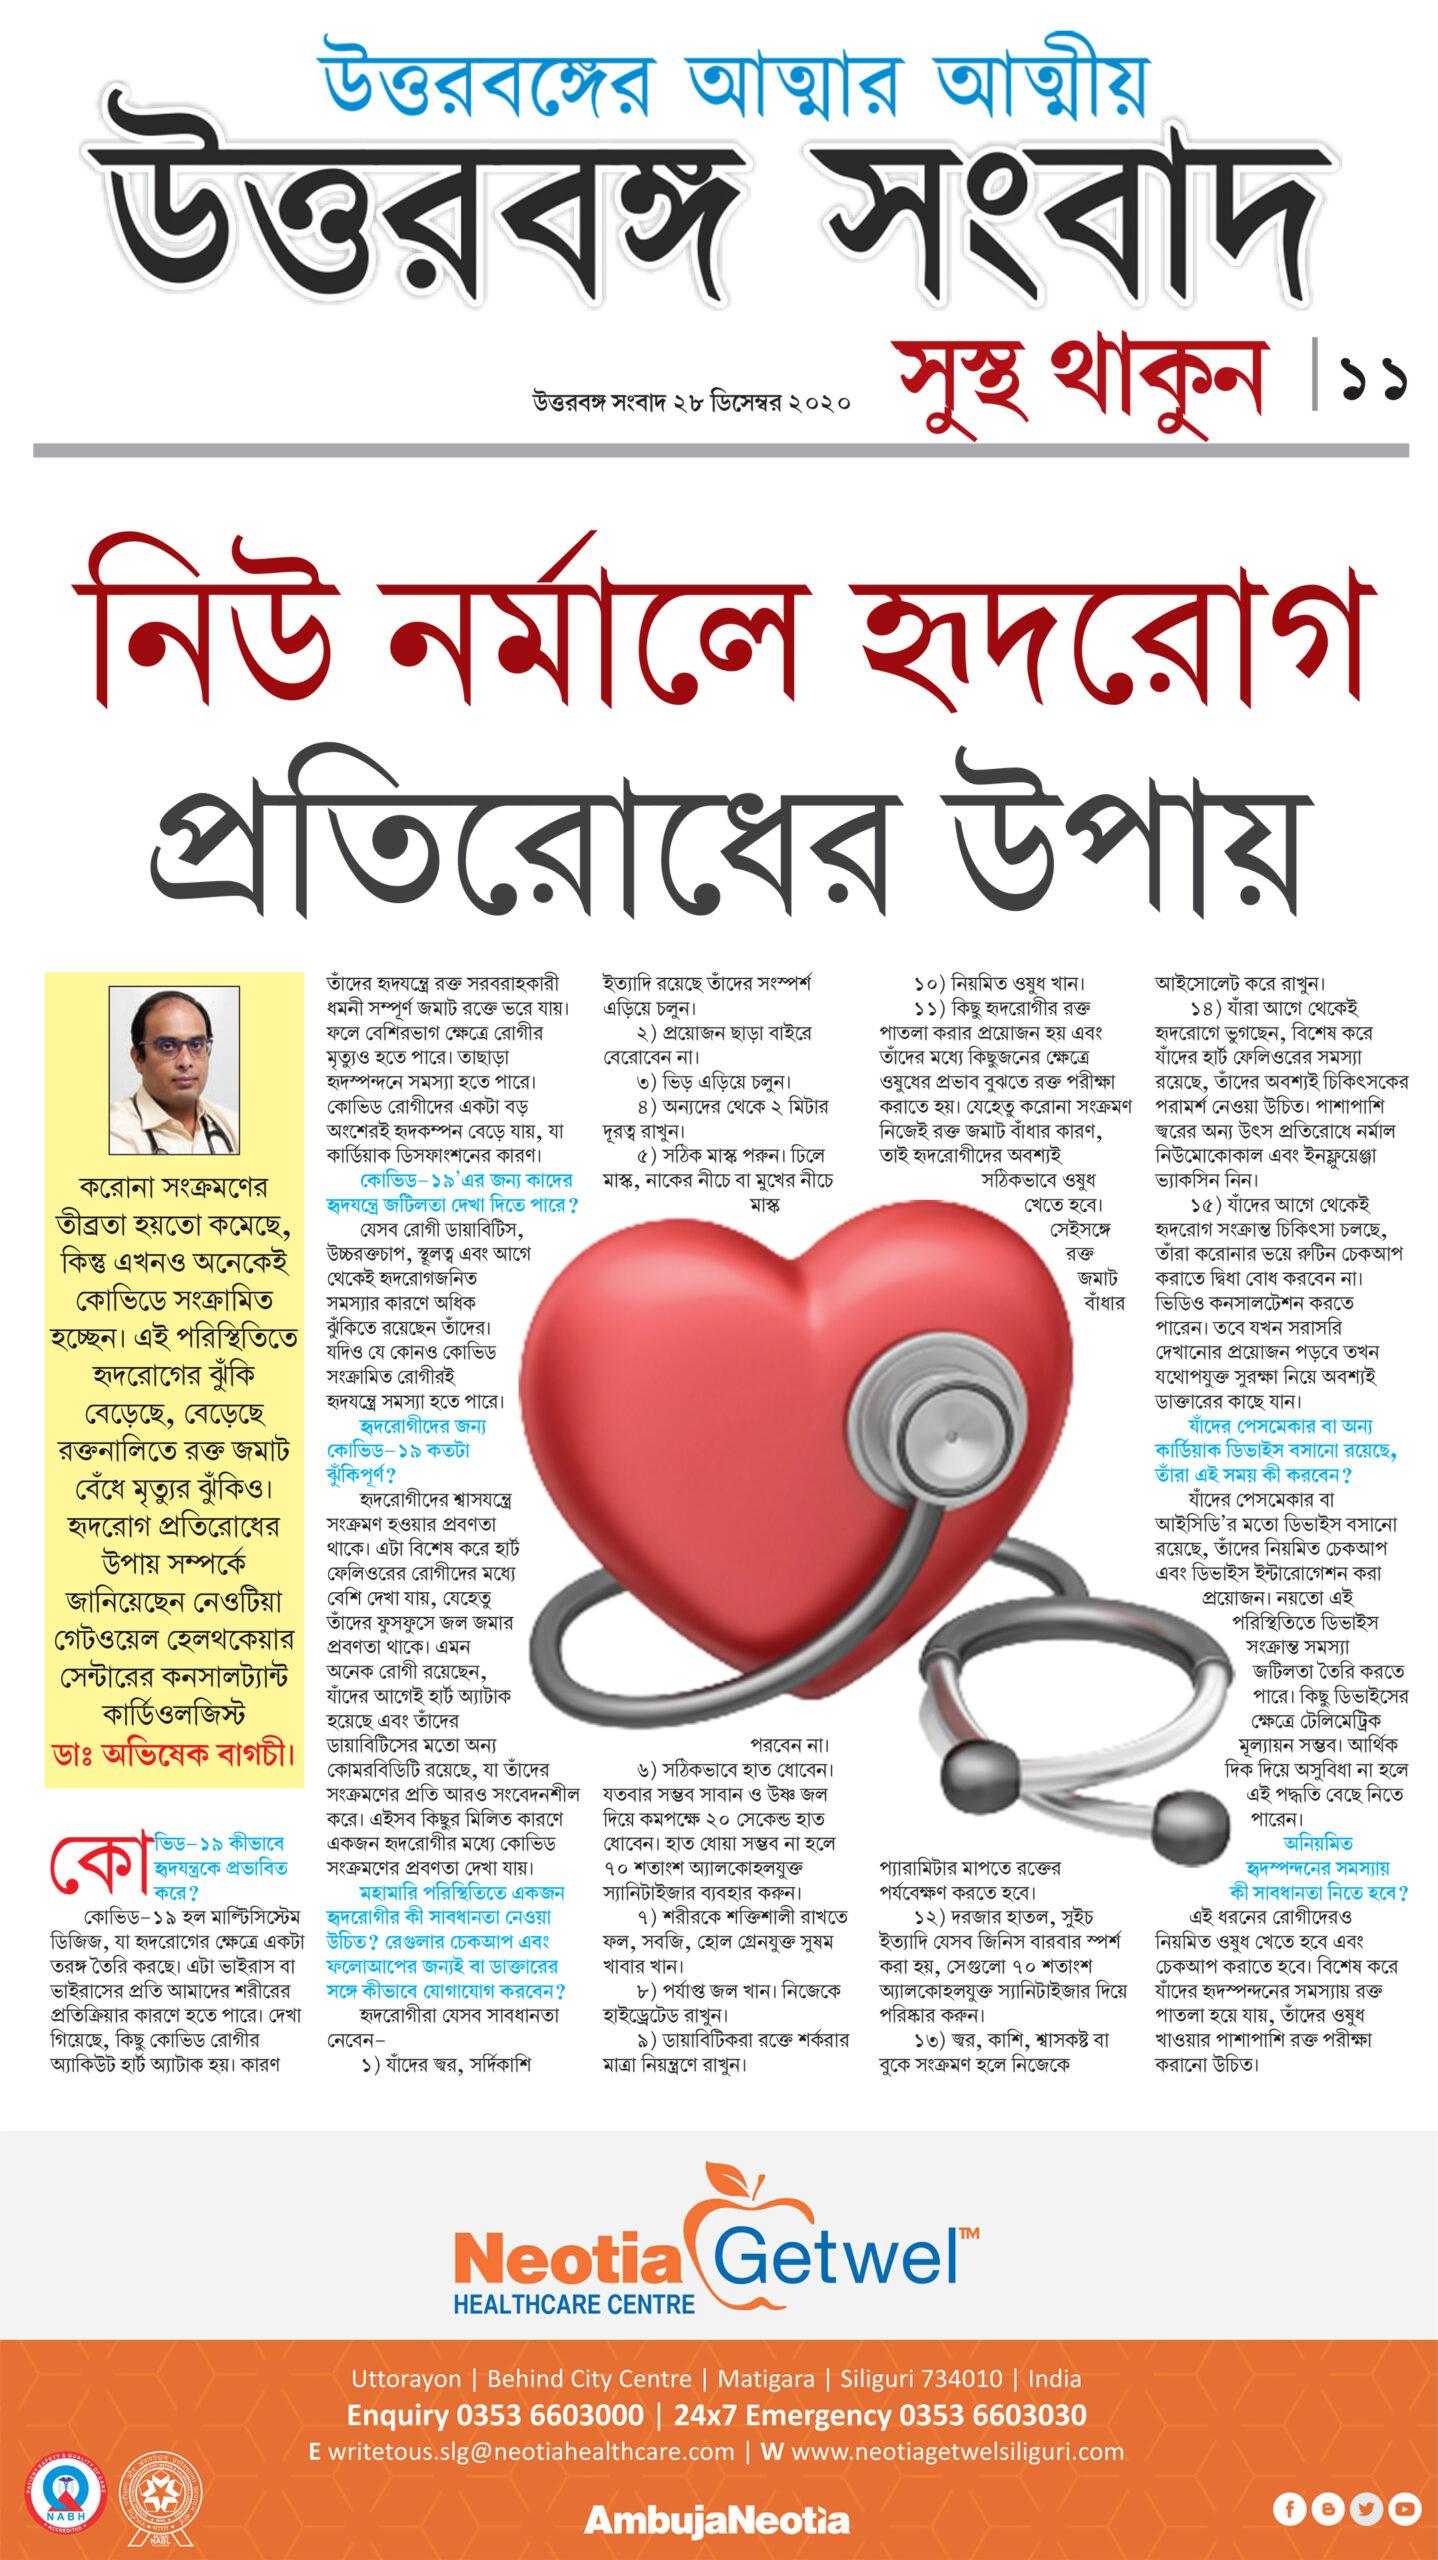 Dr. Avishek Bagchi, Consultant – Interventional Cardiologist Speaks On Cardiac Health & COVID 19